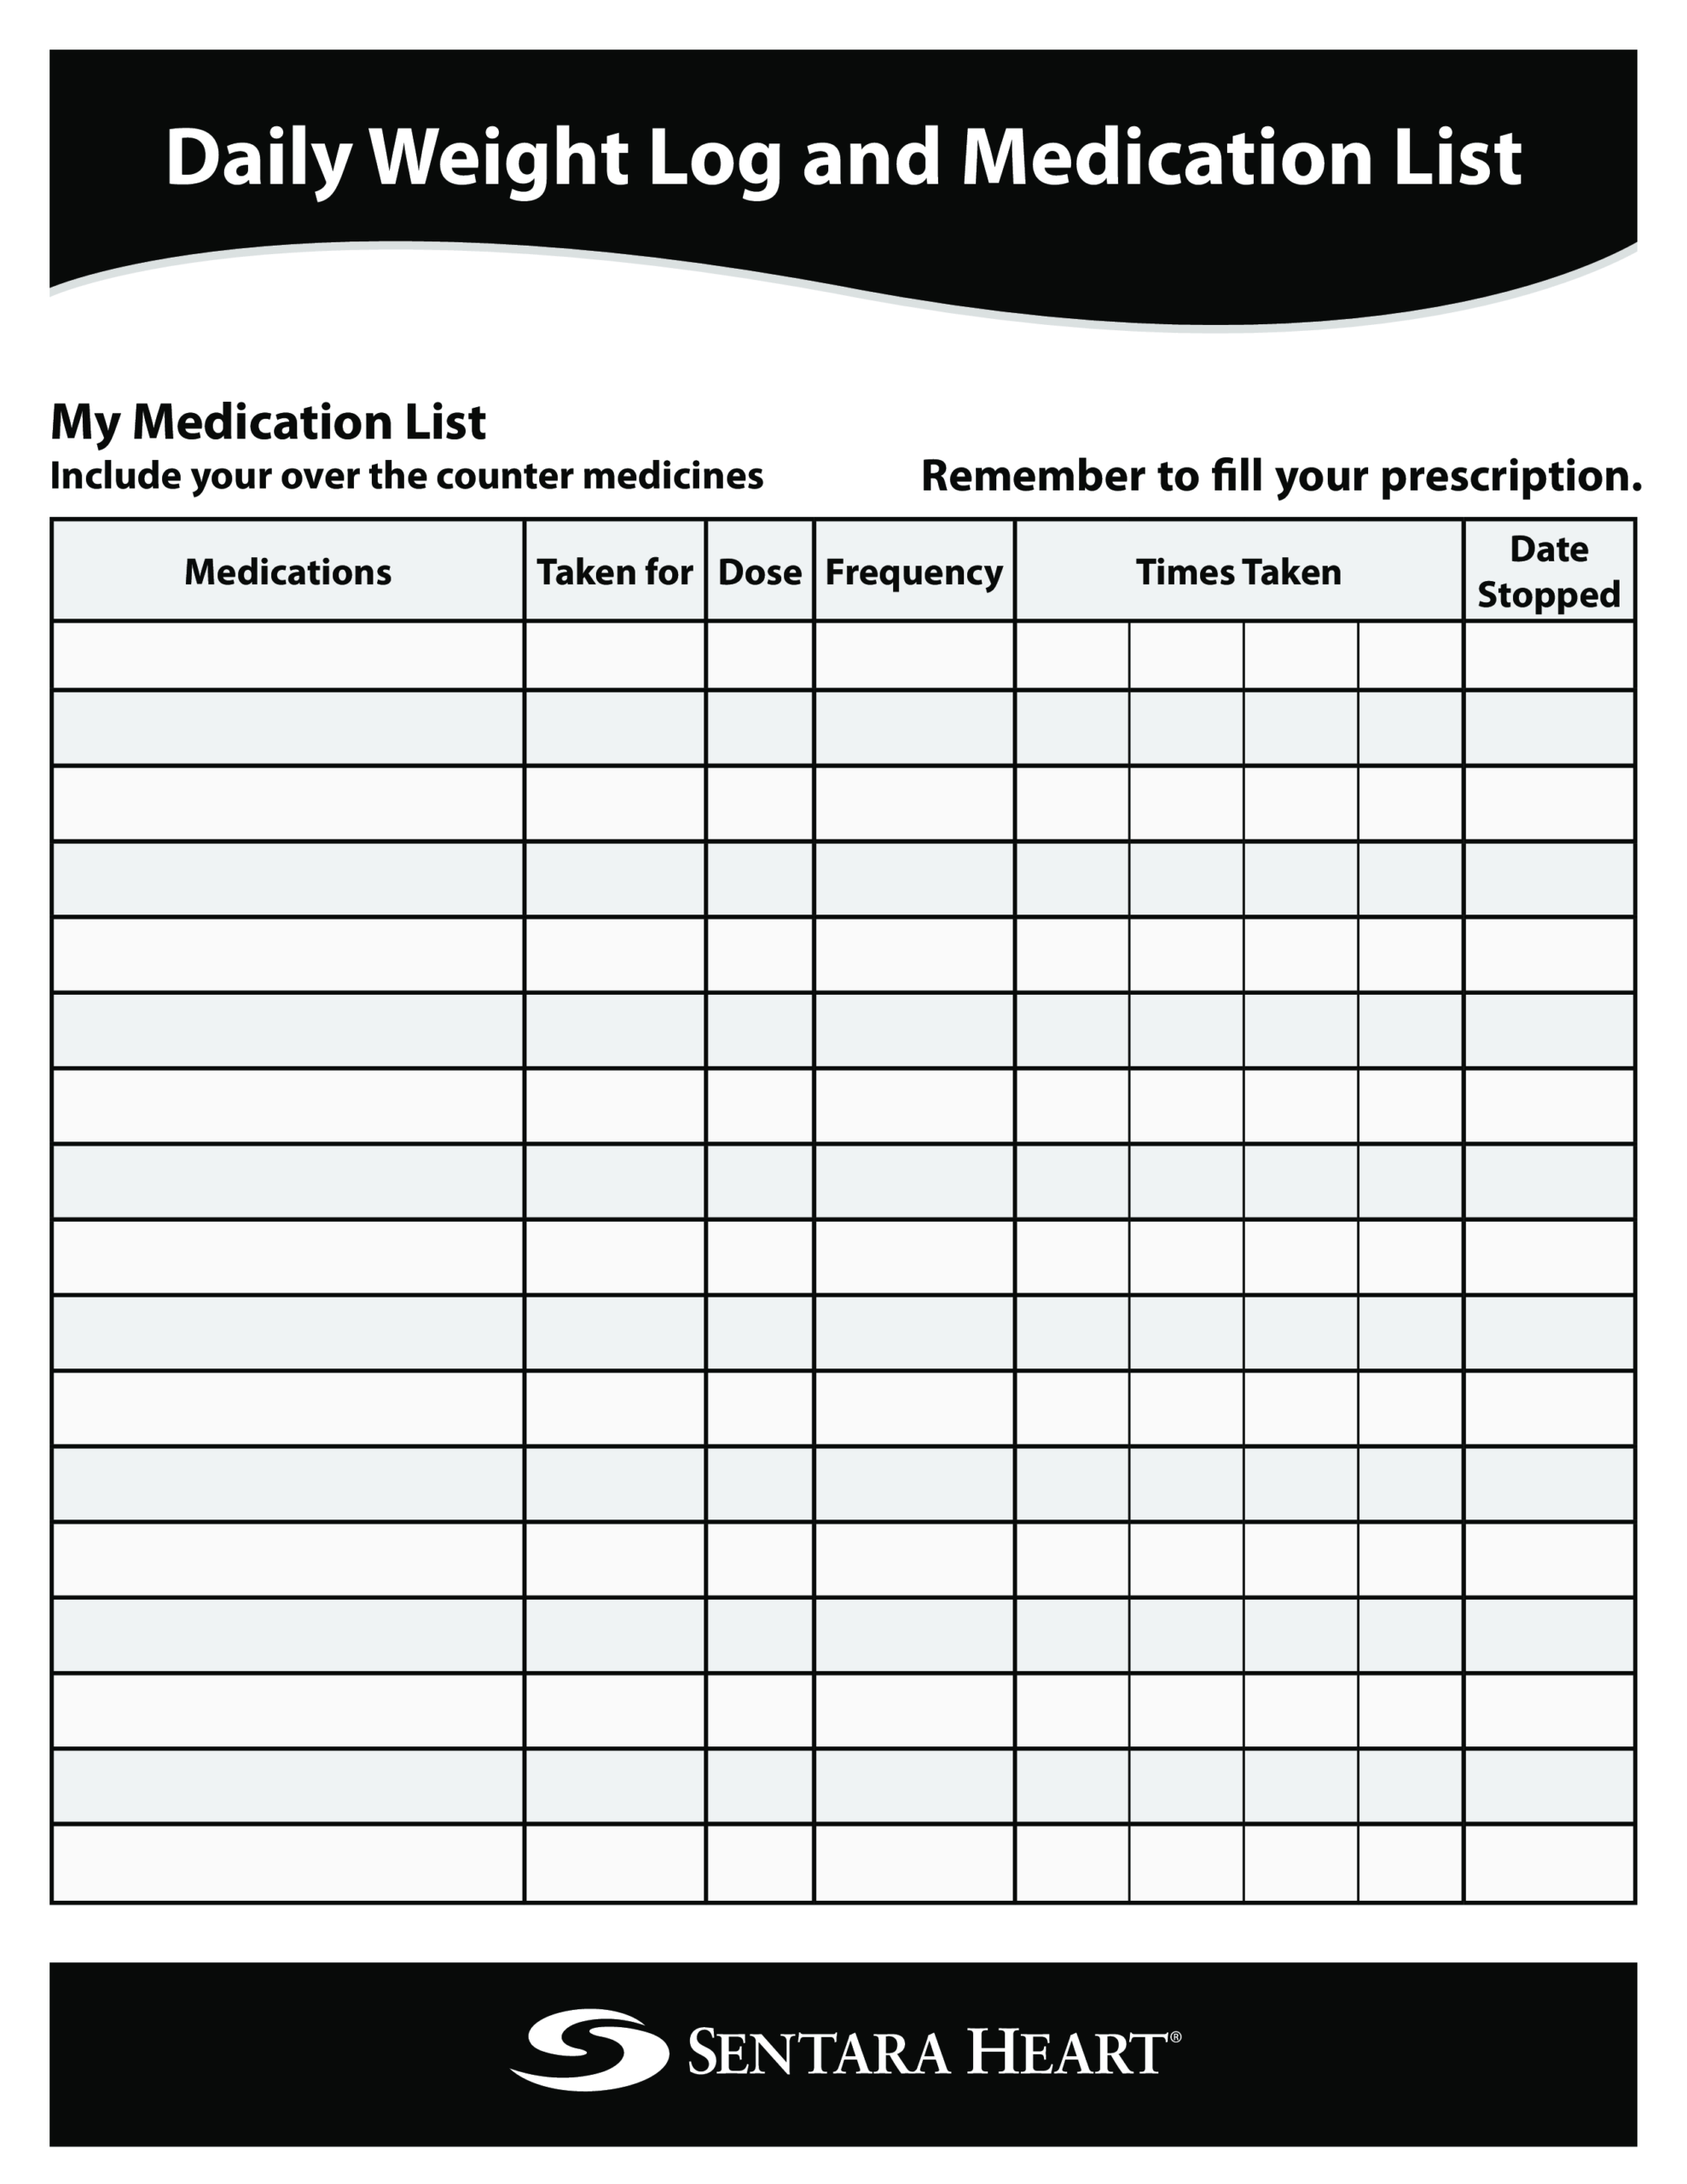 Daily Medication List Printable | Templates At Intended For Blank Medication List Templates